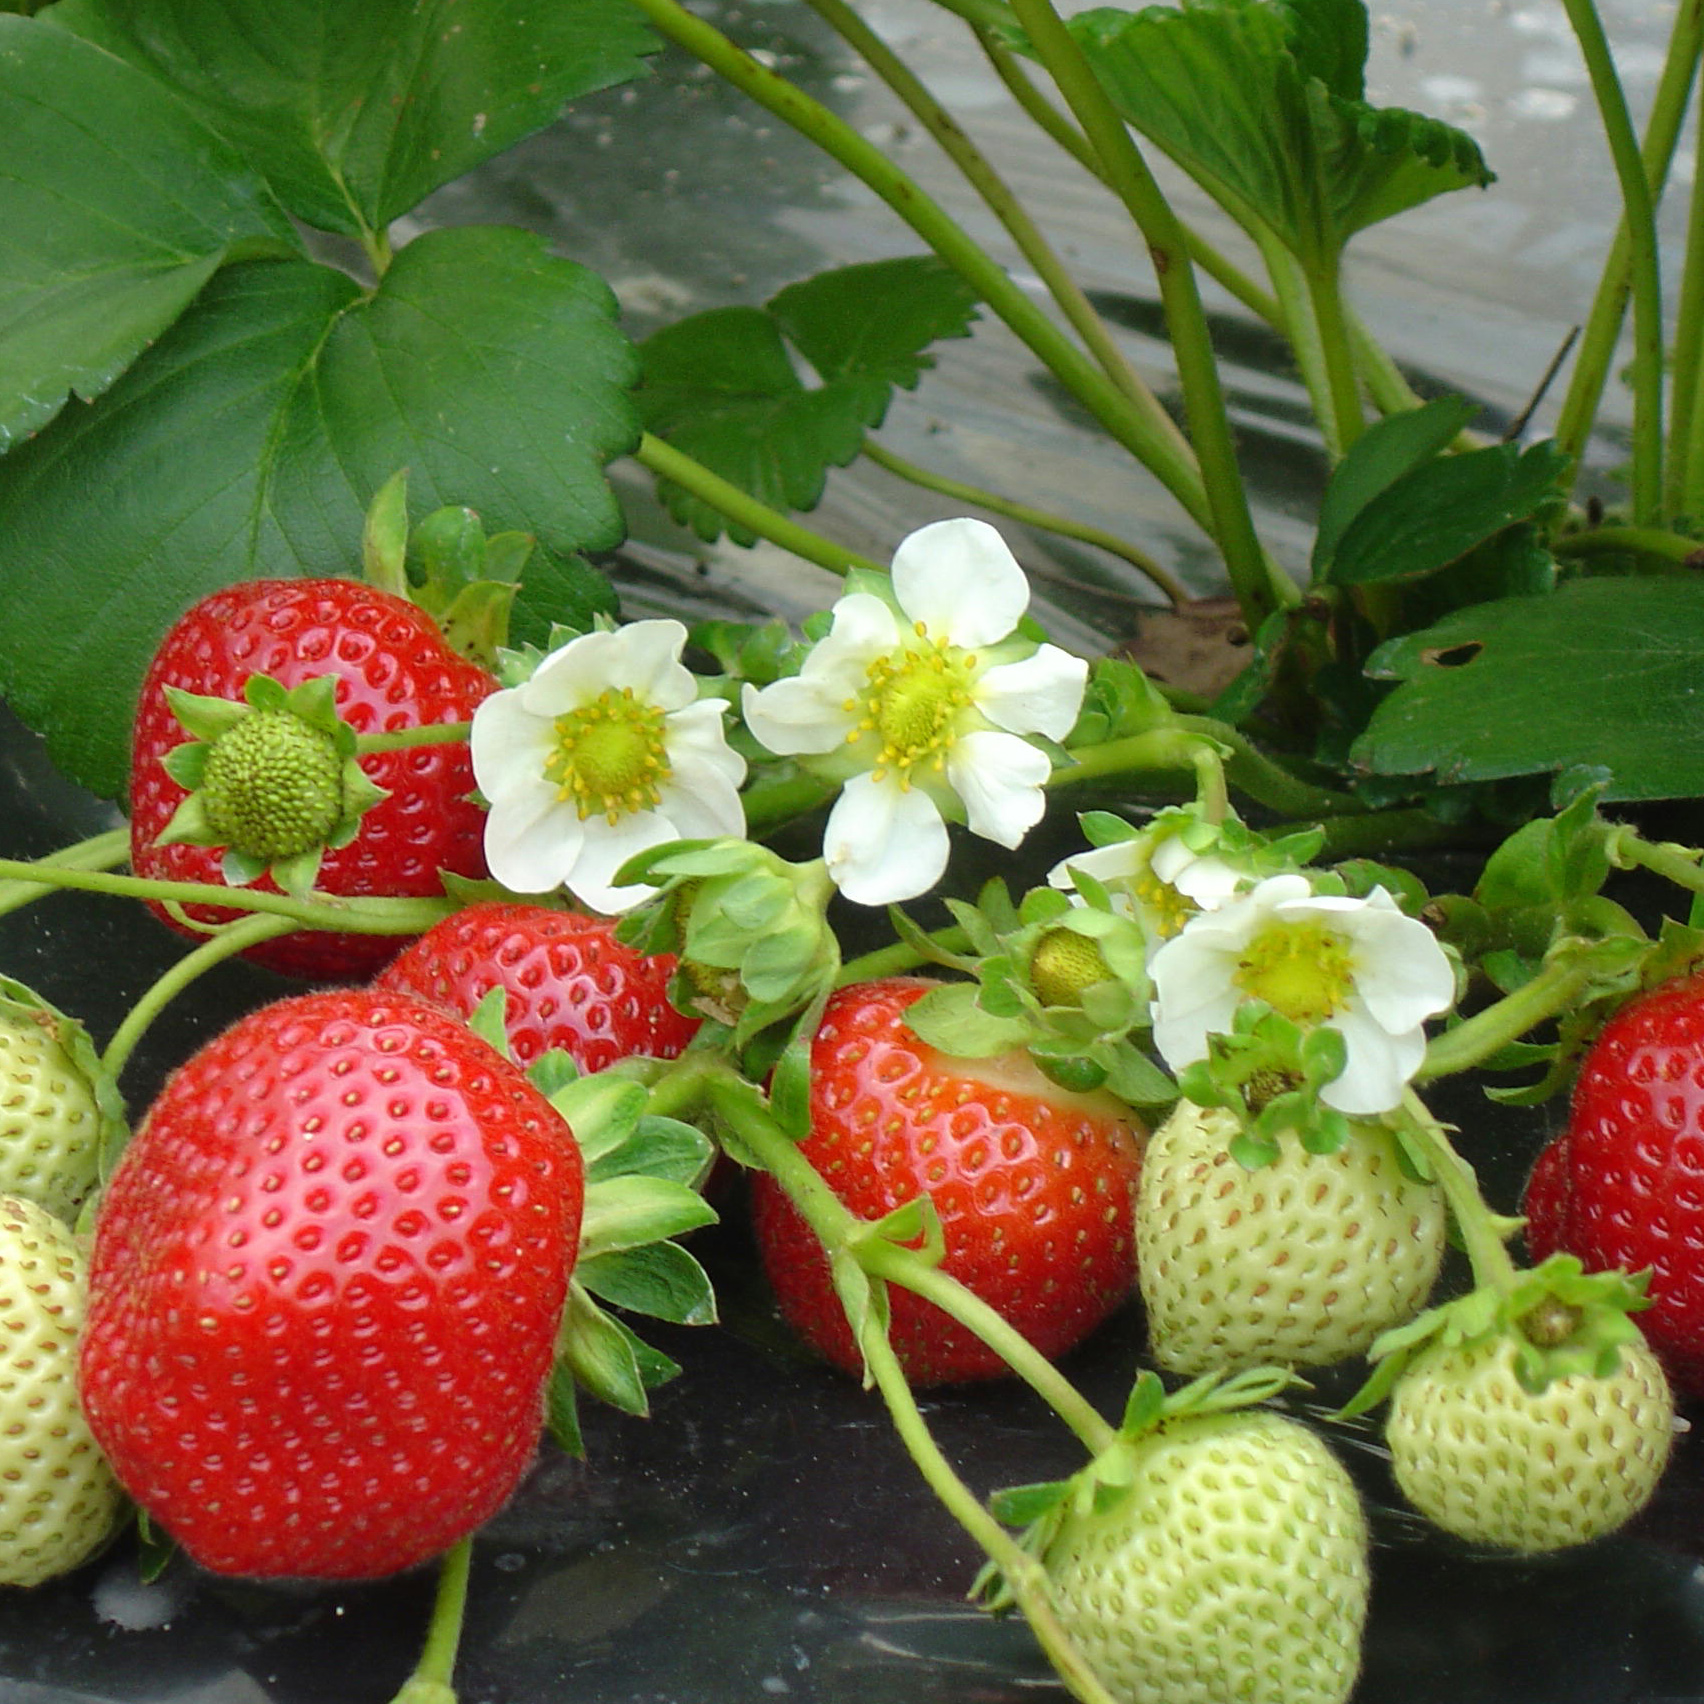 planter et cultiver les fraisiers. Black Bedroom Furniture Sets. Home Design Ideas